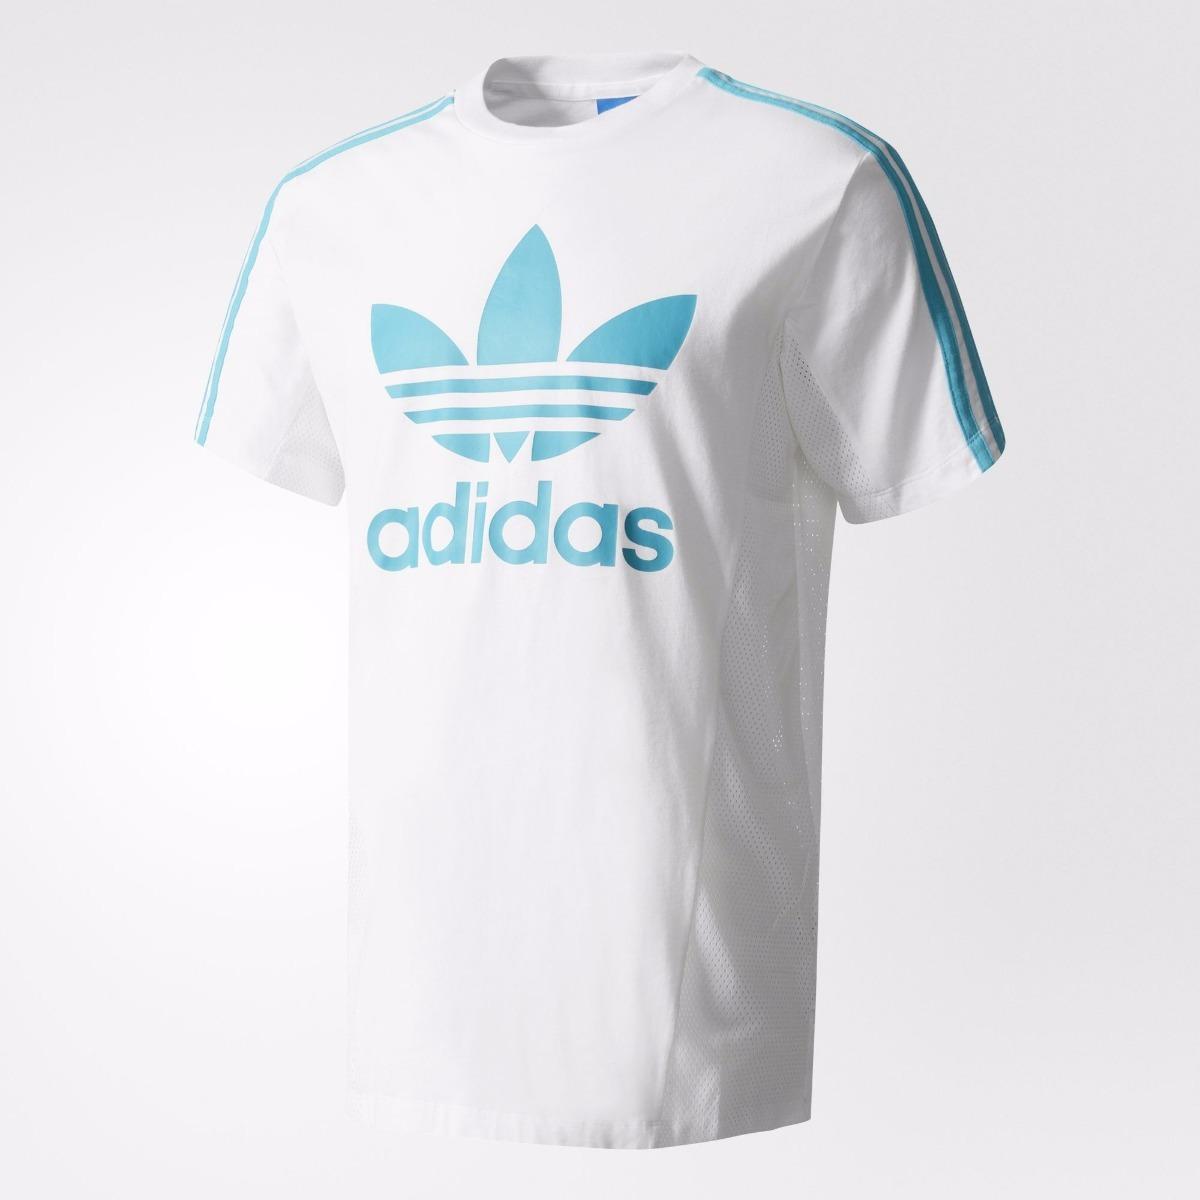 camiseta adidas trefoil los angeles original novo. Carregando zoom. 9618f979b9f12